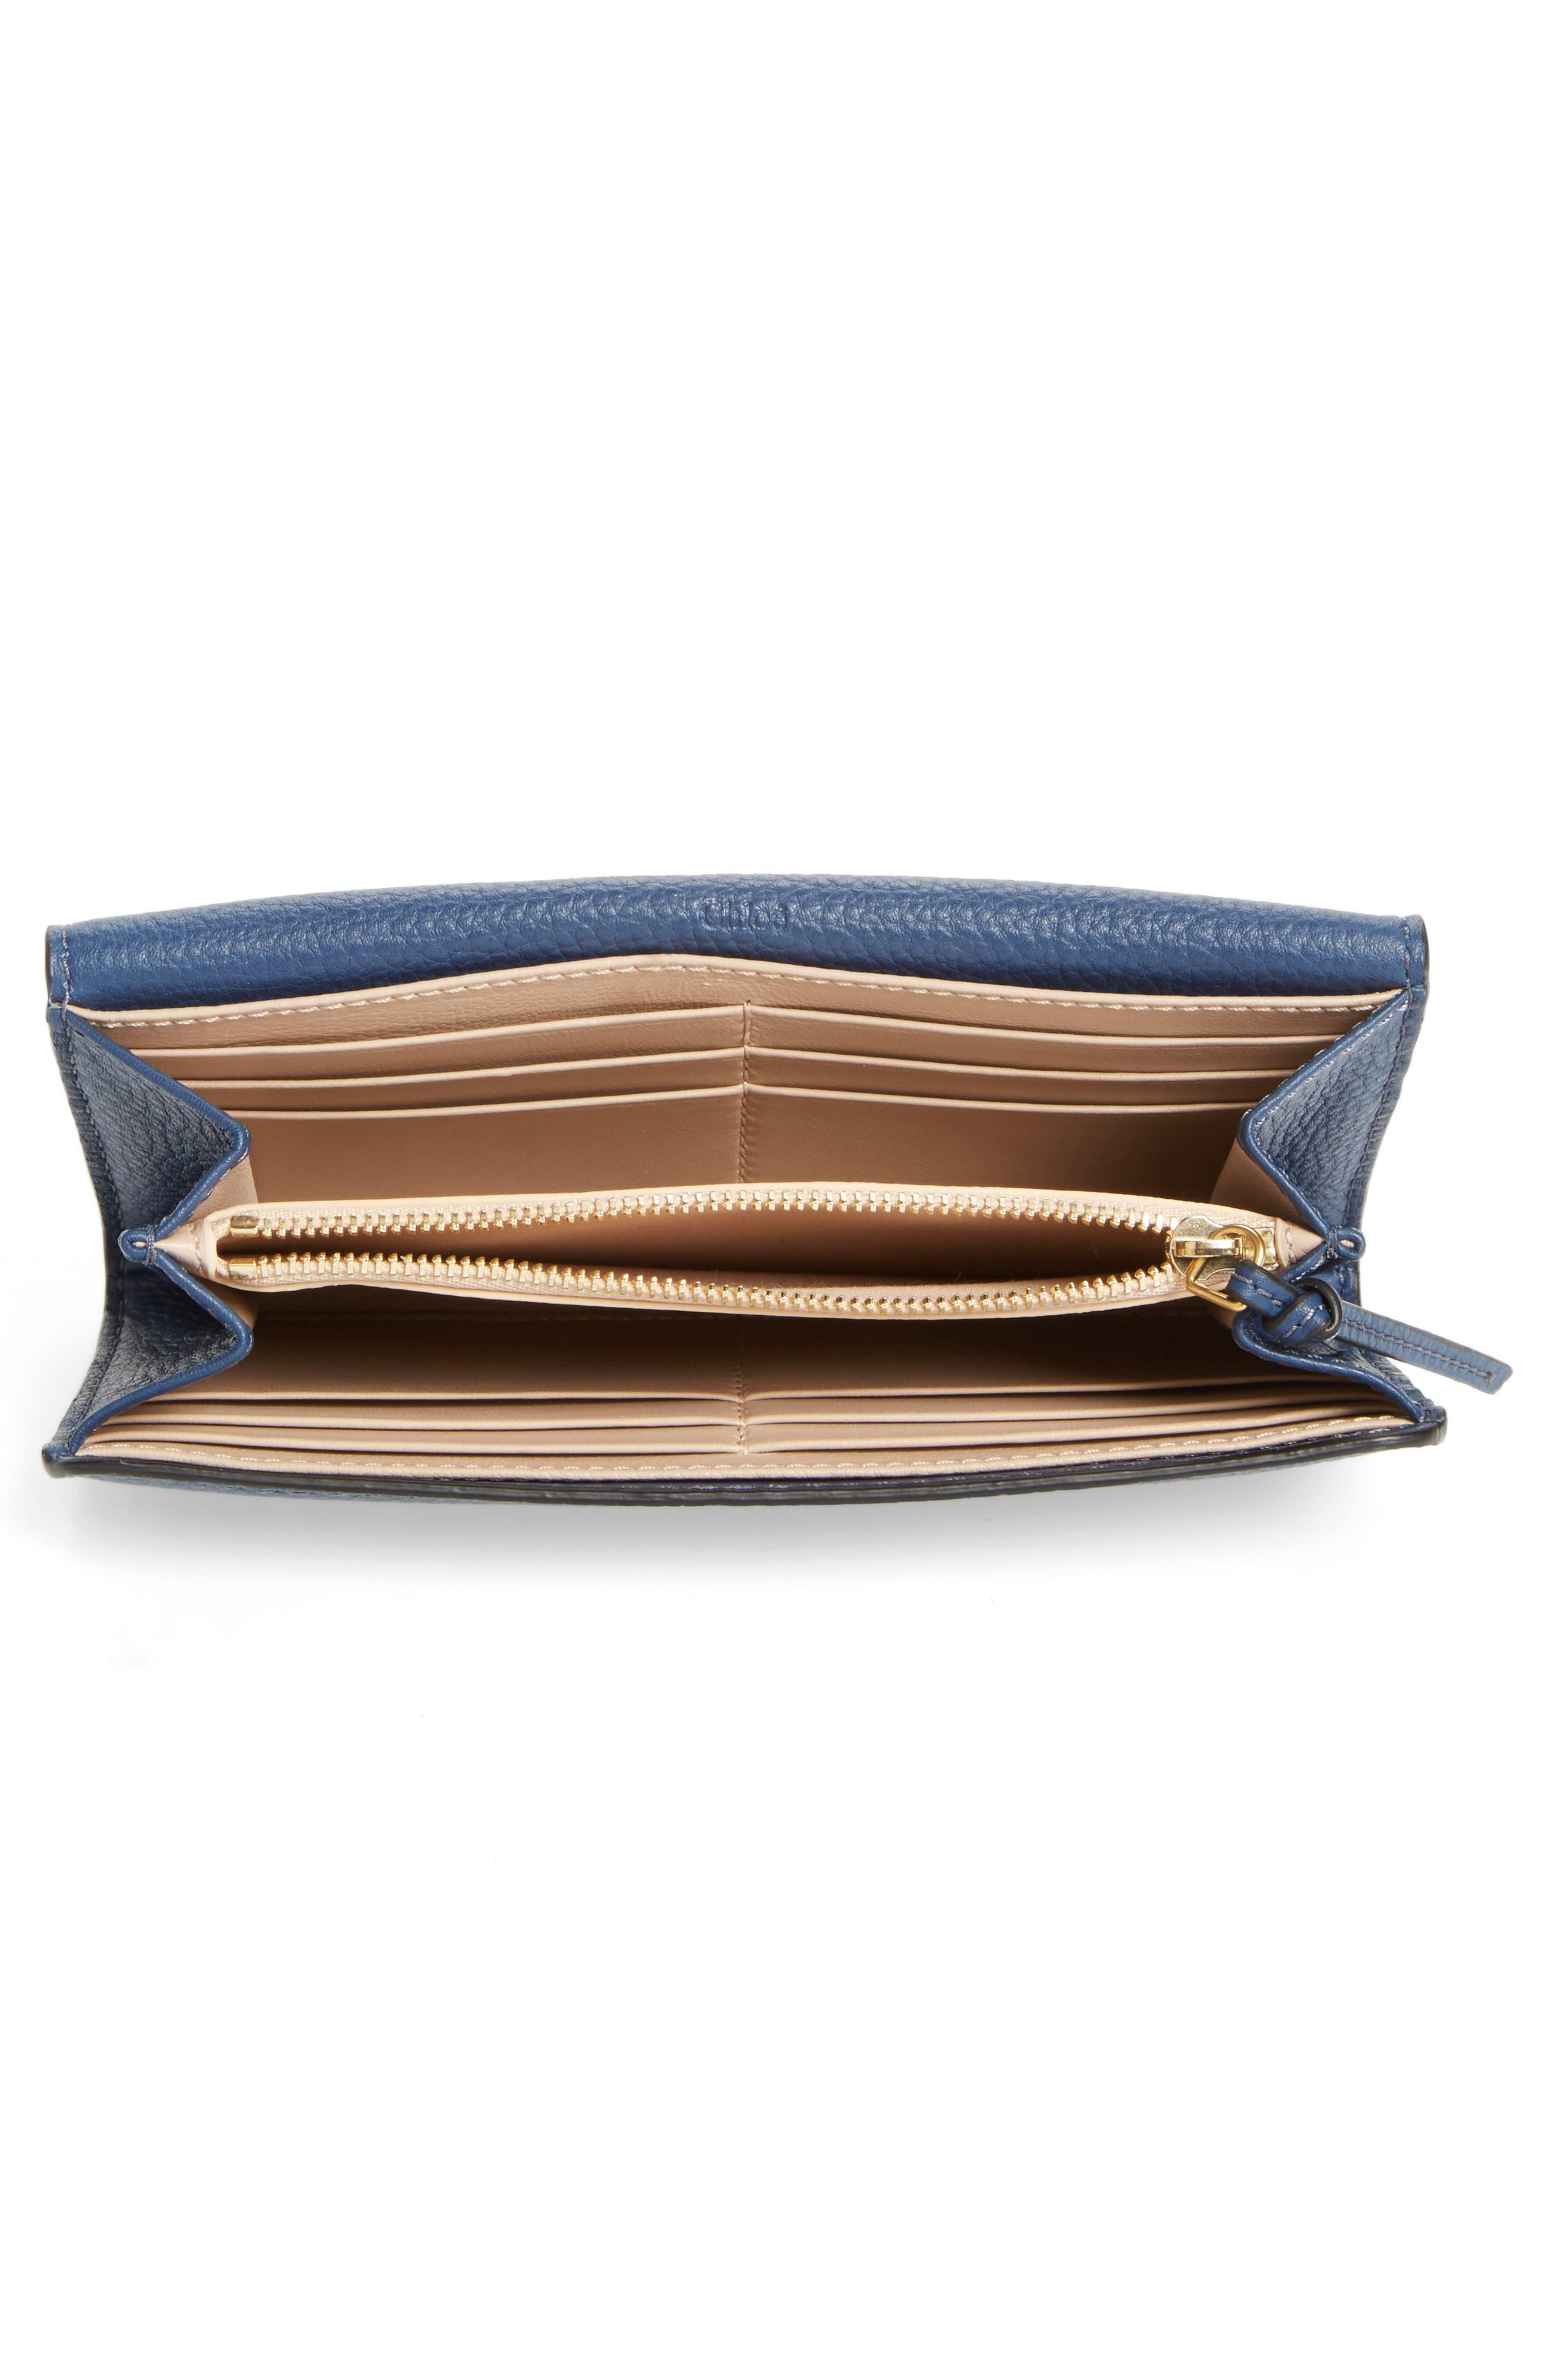 Alternate Image 3  - Chloé 'Marcie - Long' Leather Flap Wallet